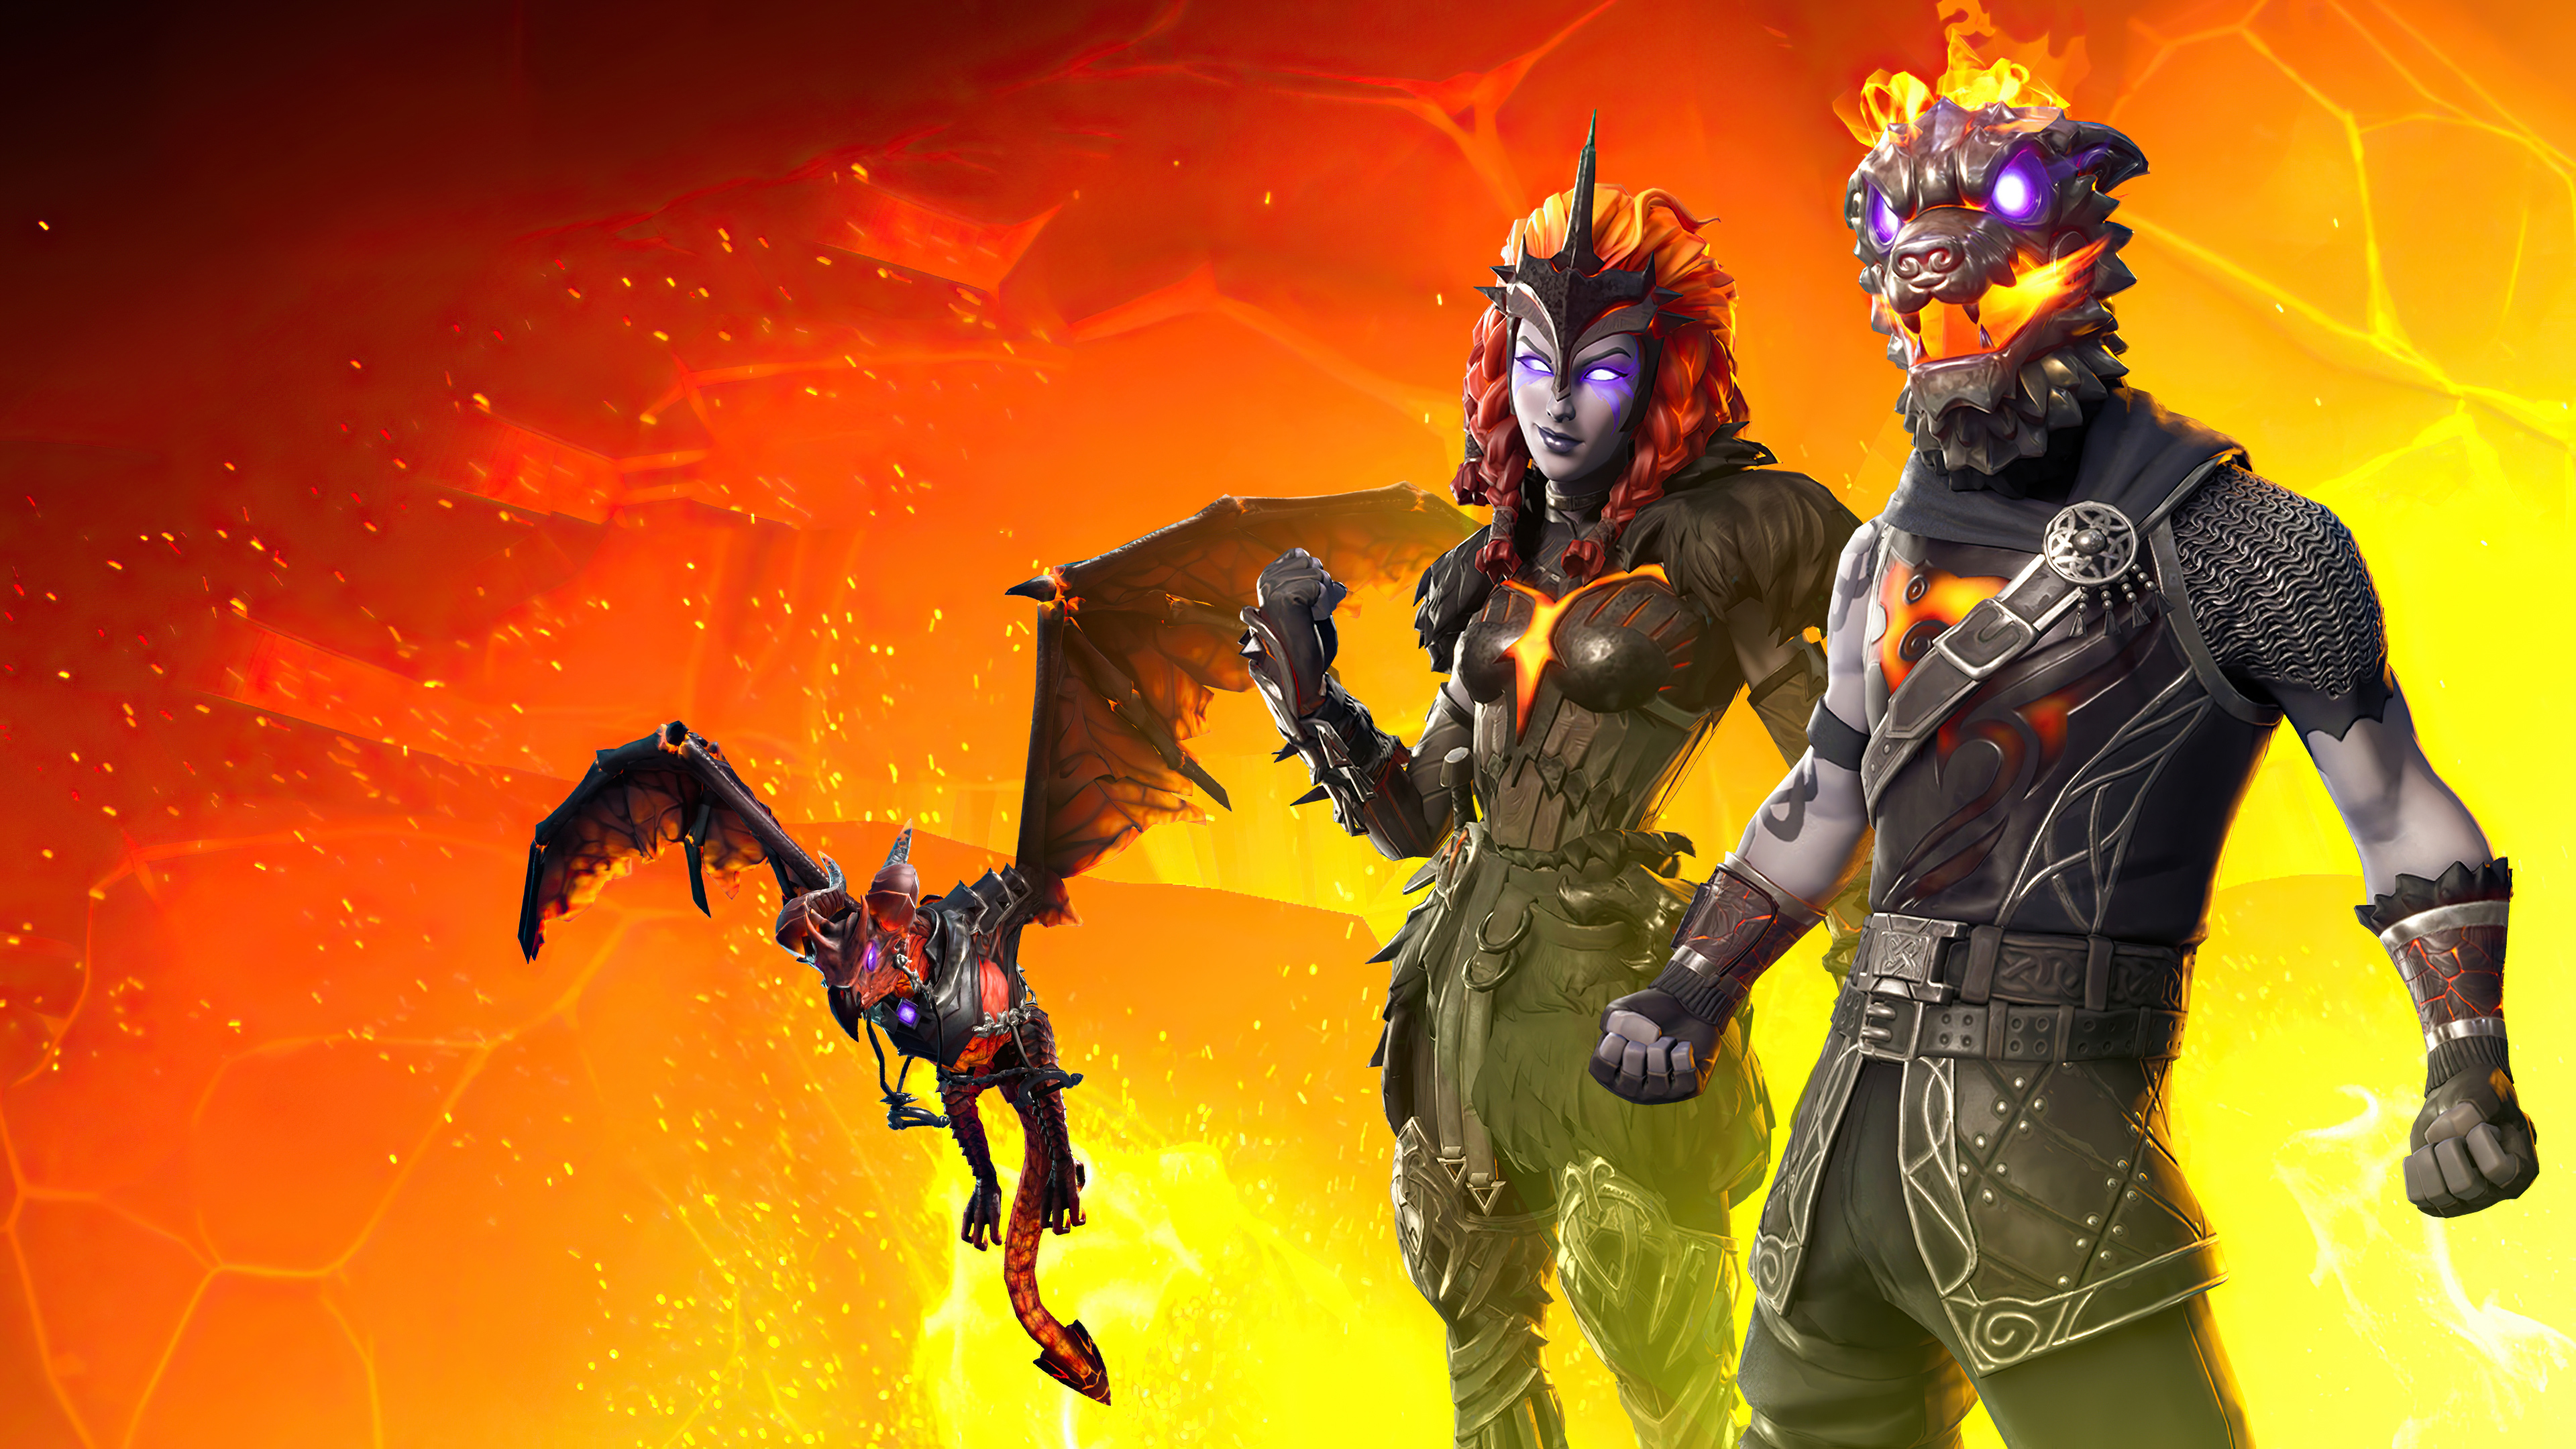 New 2020 Fortnite Lava Wallpaper, HD Games 4K Wallpapers ...